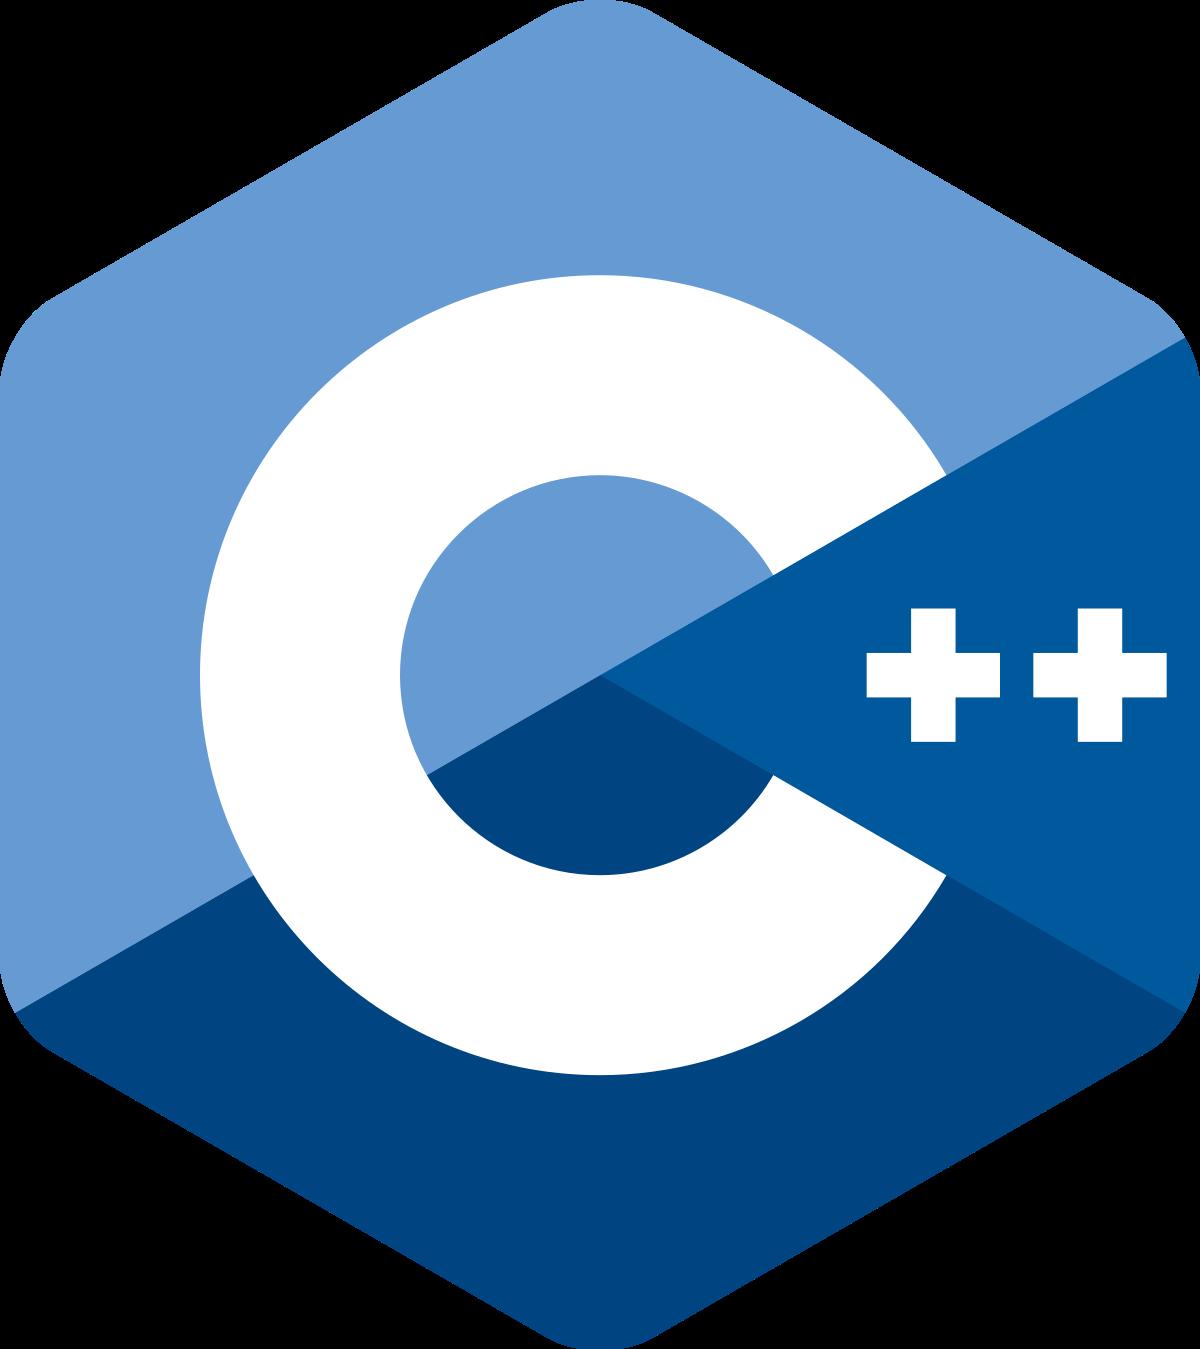 c++-netcollege